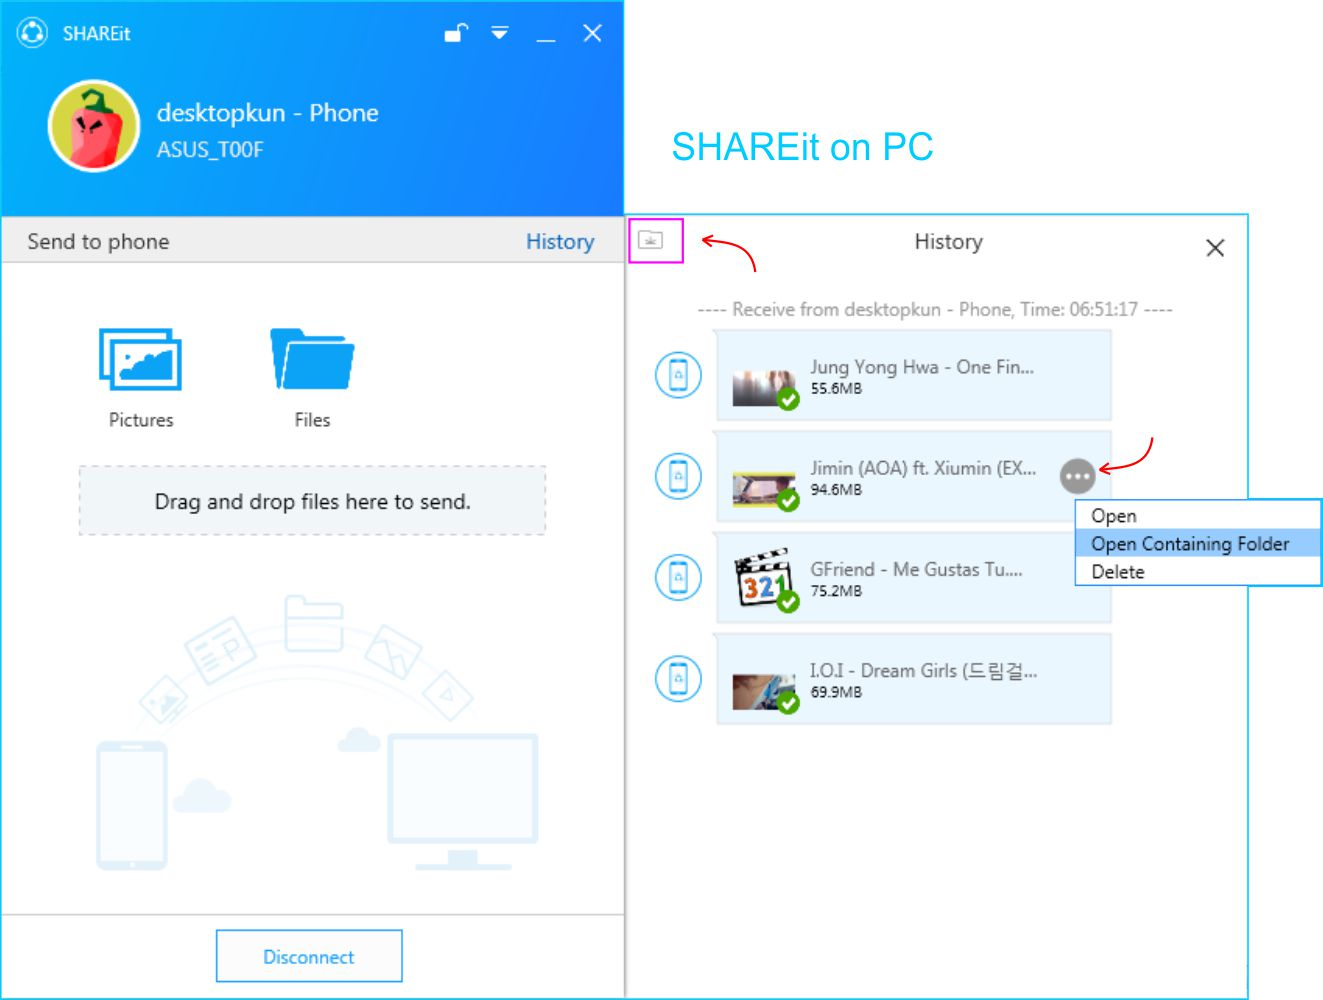 SHAREit - Cari Folder Penyimpanan File Yang Telah Dikirim